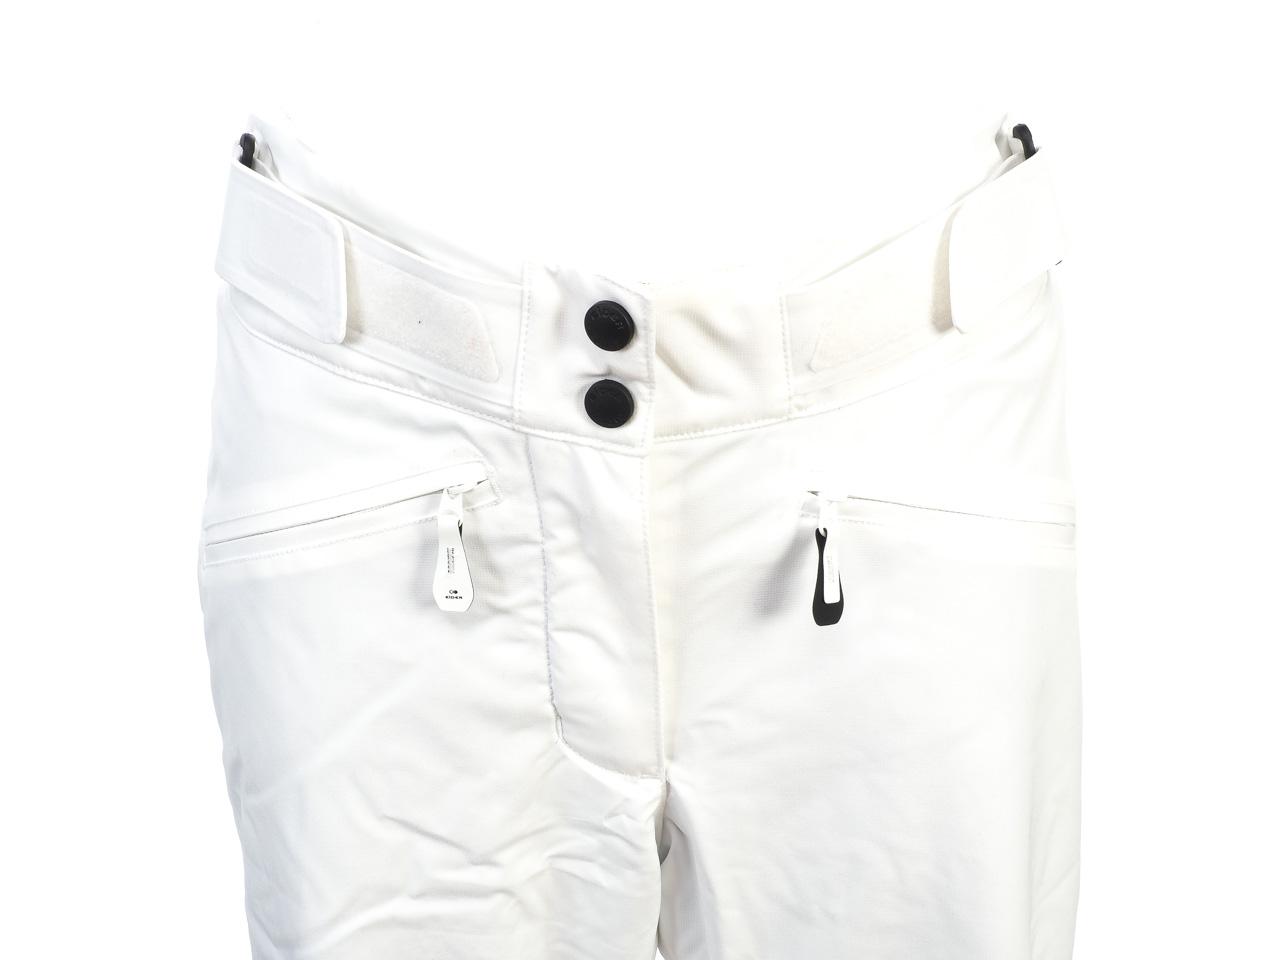 Ski-Pants-Surf-Eider-on-the-Molina-Pant-White-L-White-26880-New thumbnail 2